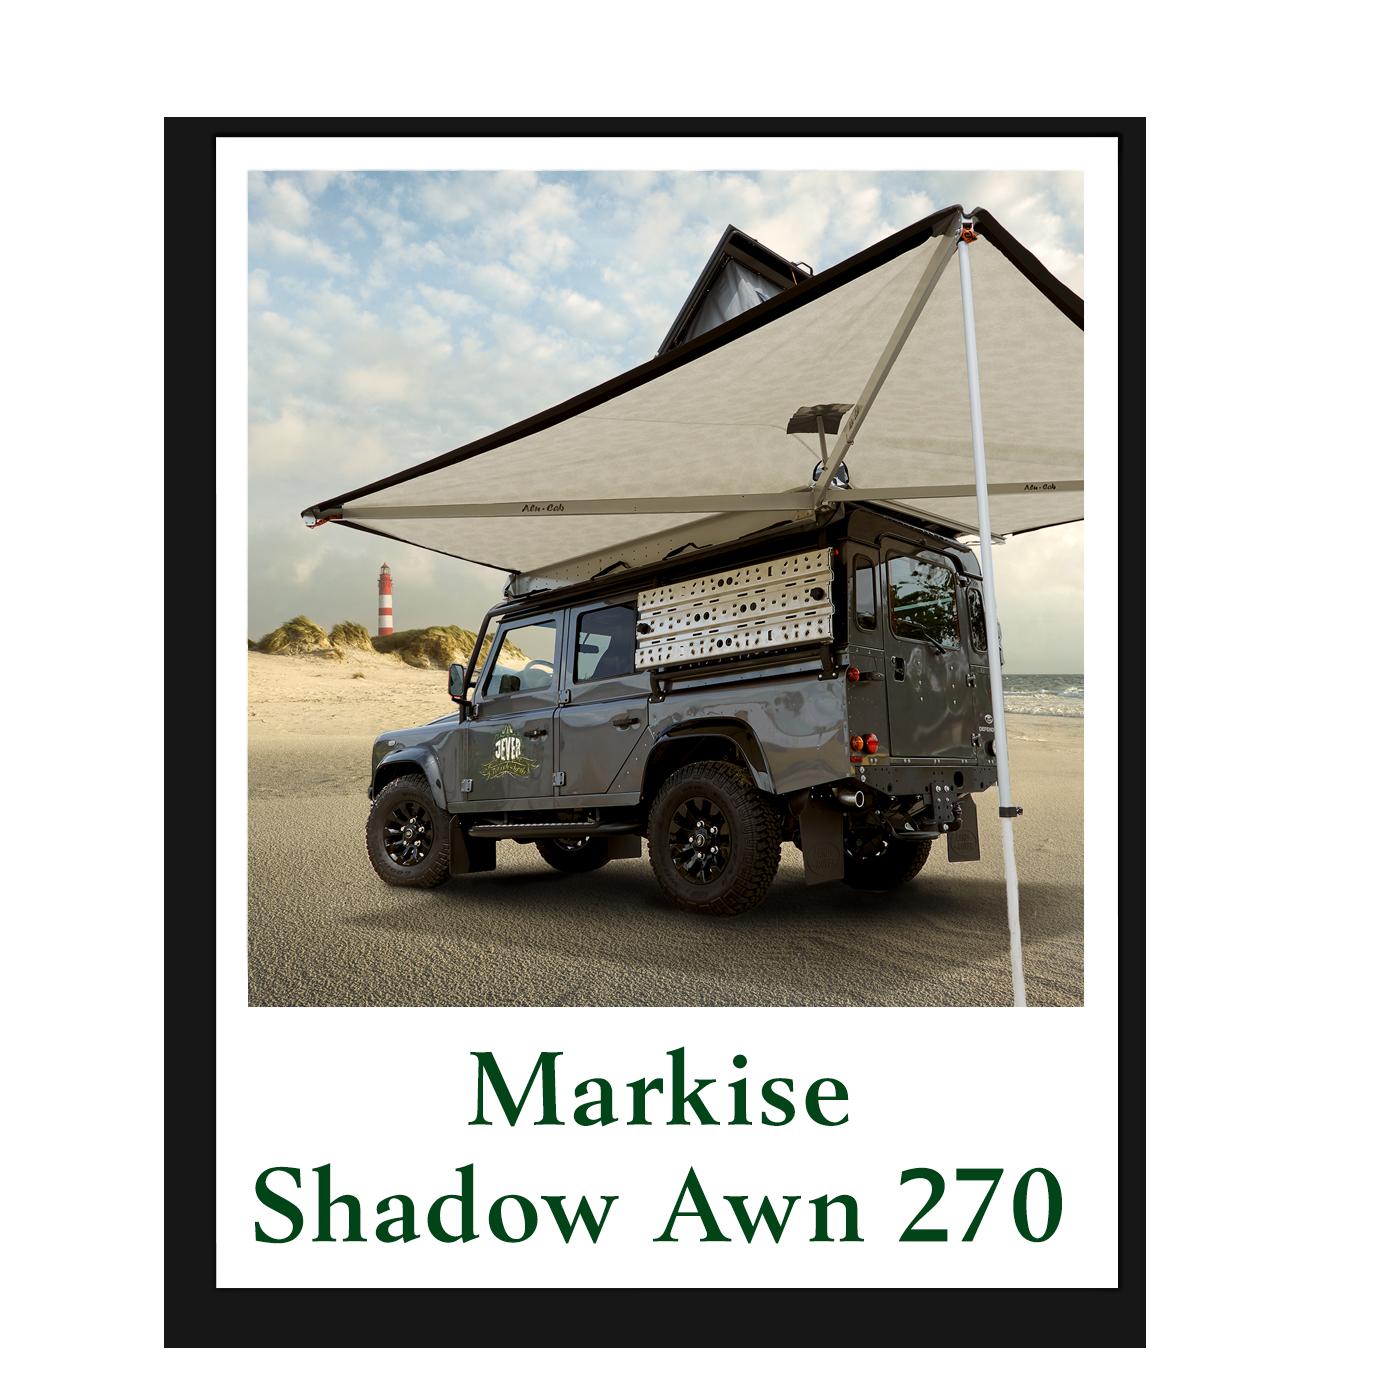 160902_markise_shadow_awn-270